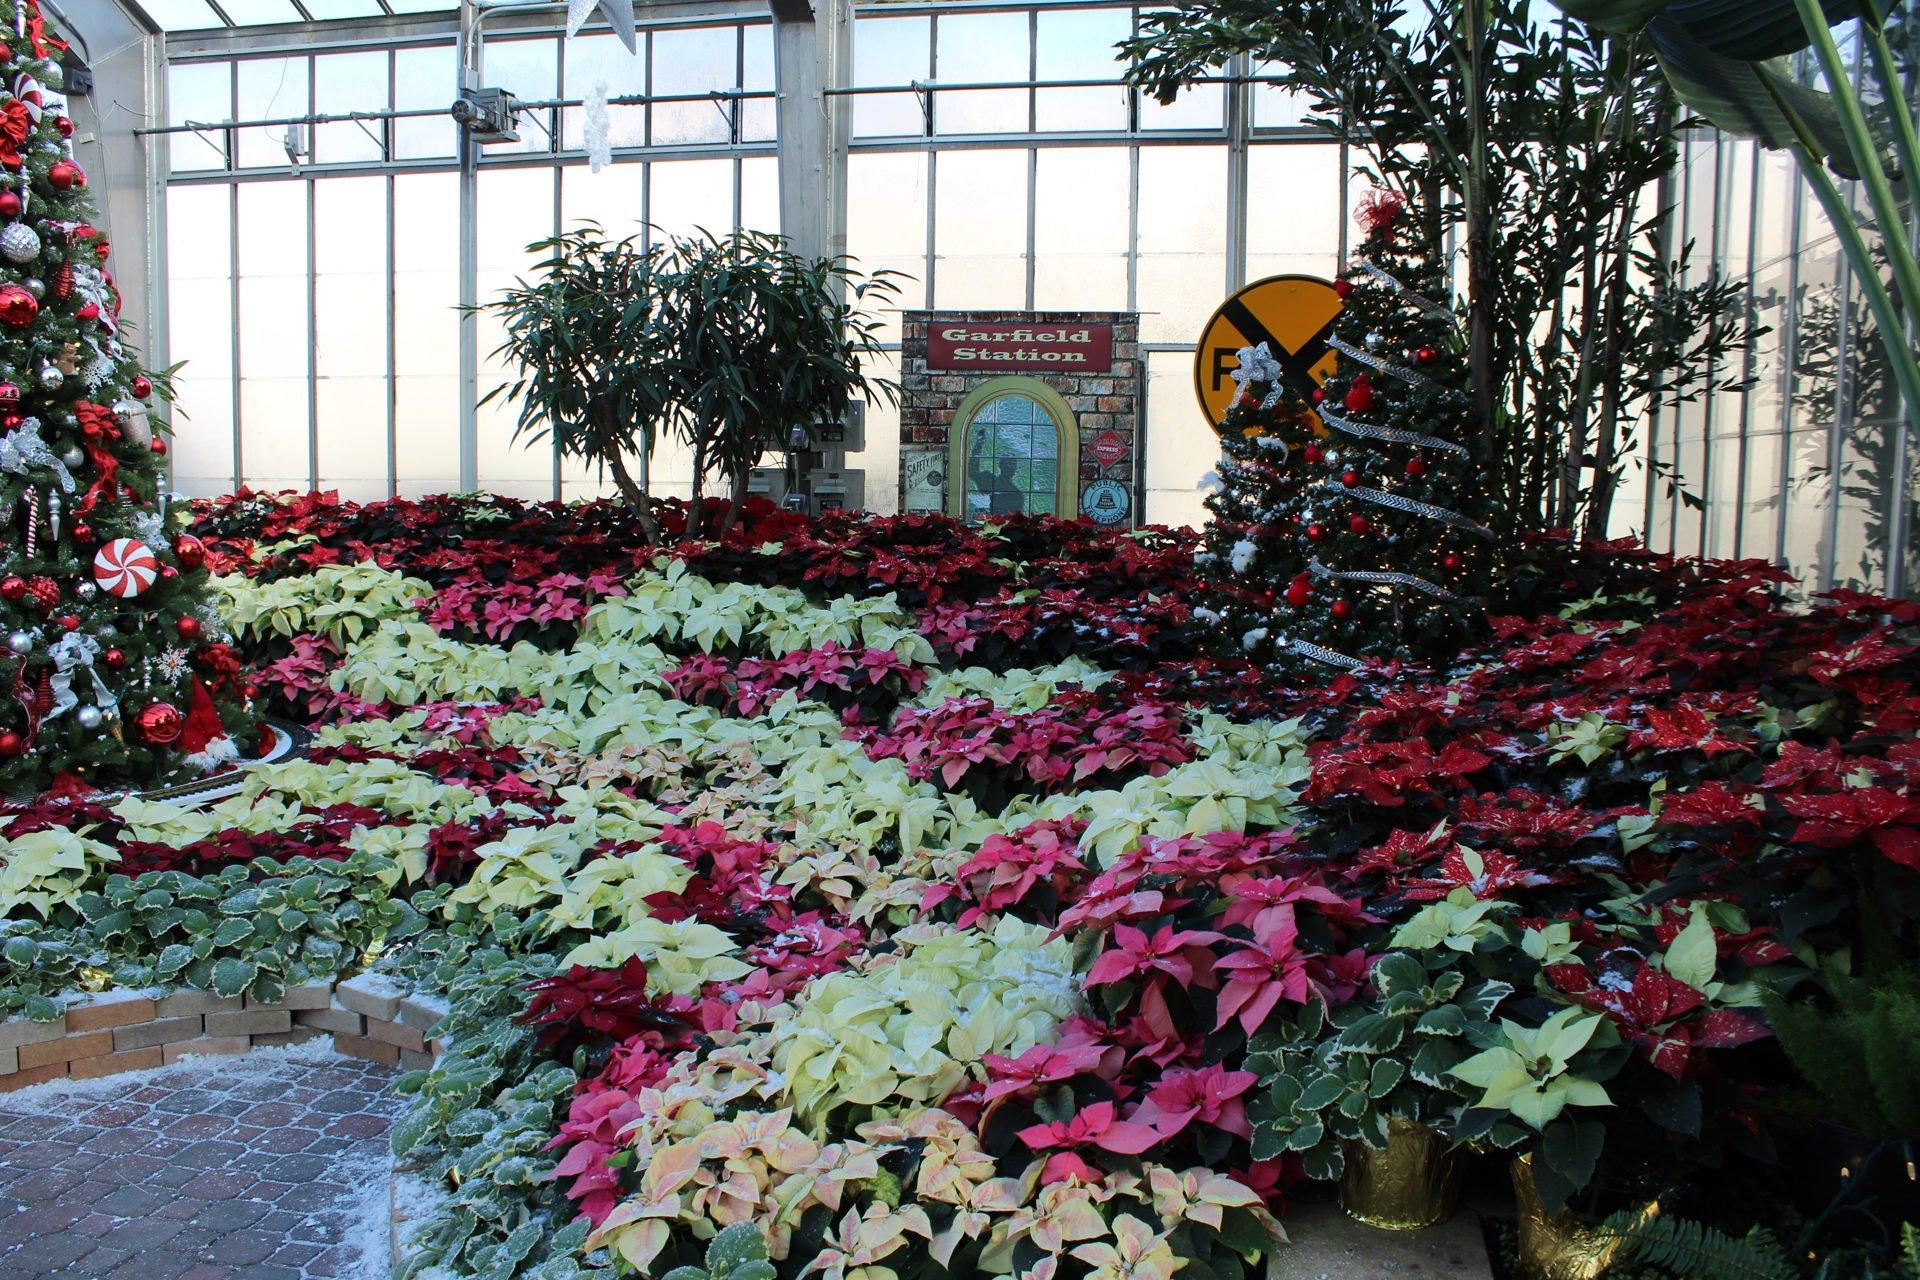 Garfield Conservatory holiday display